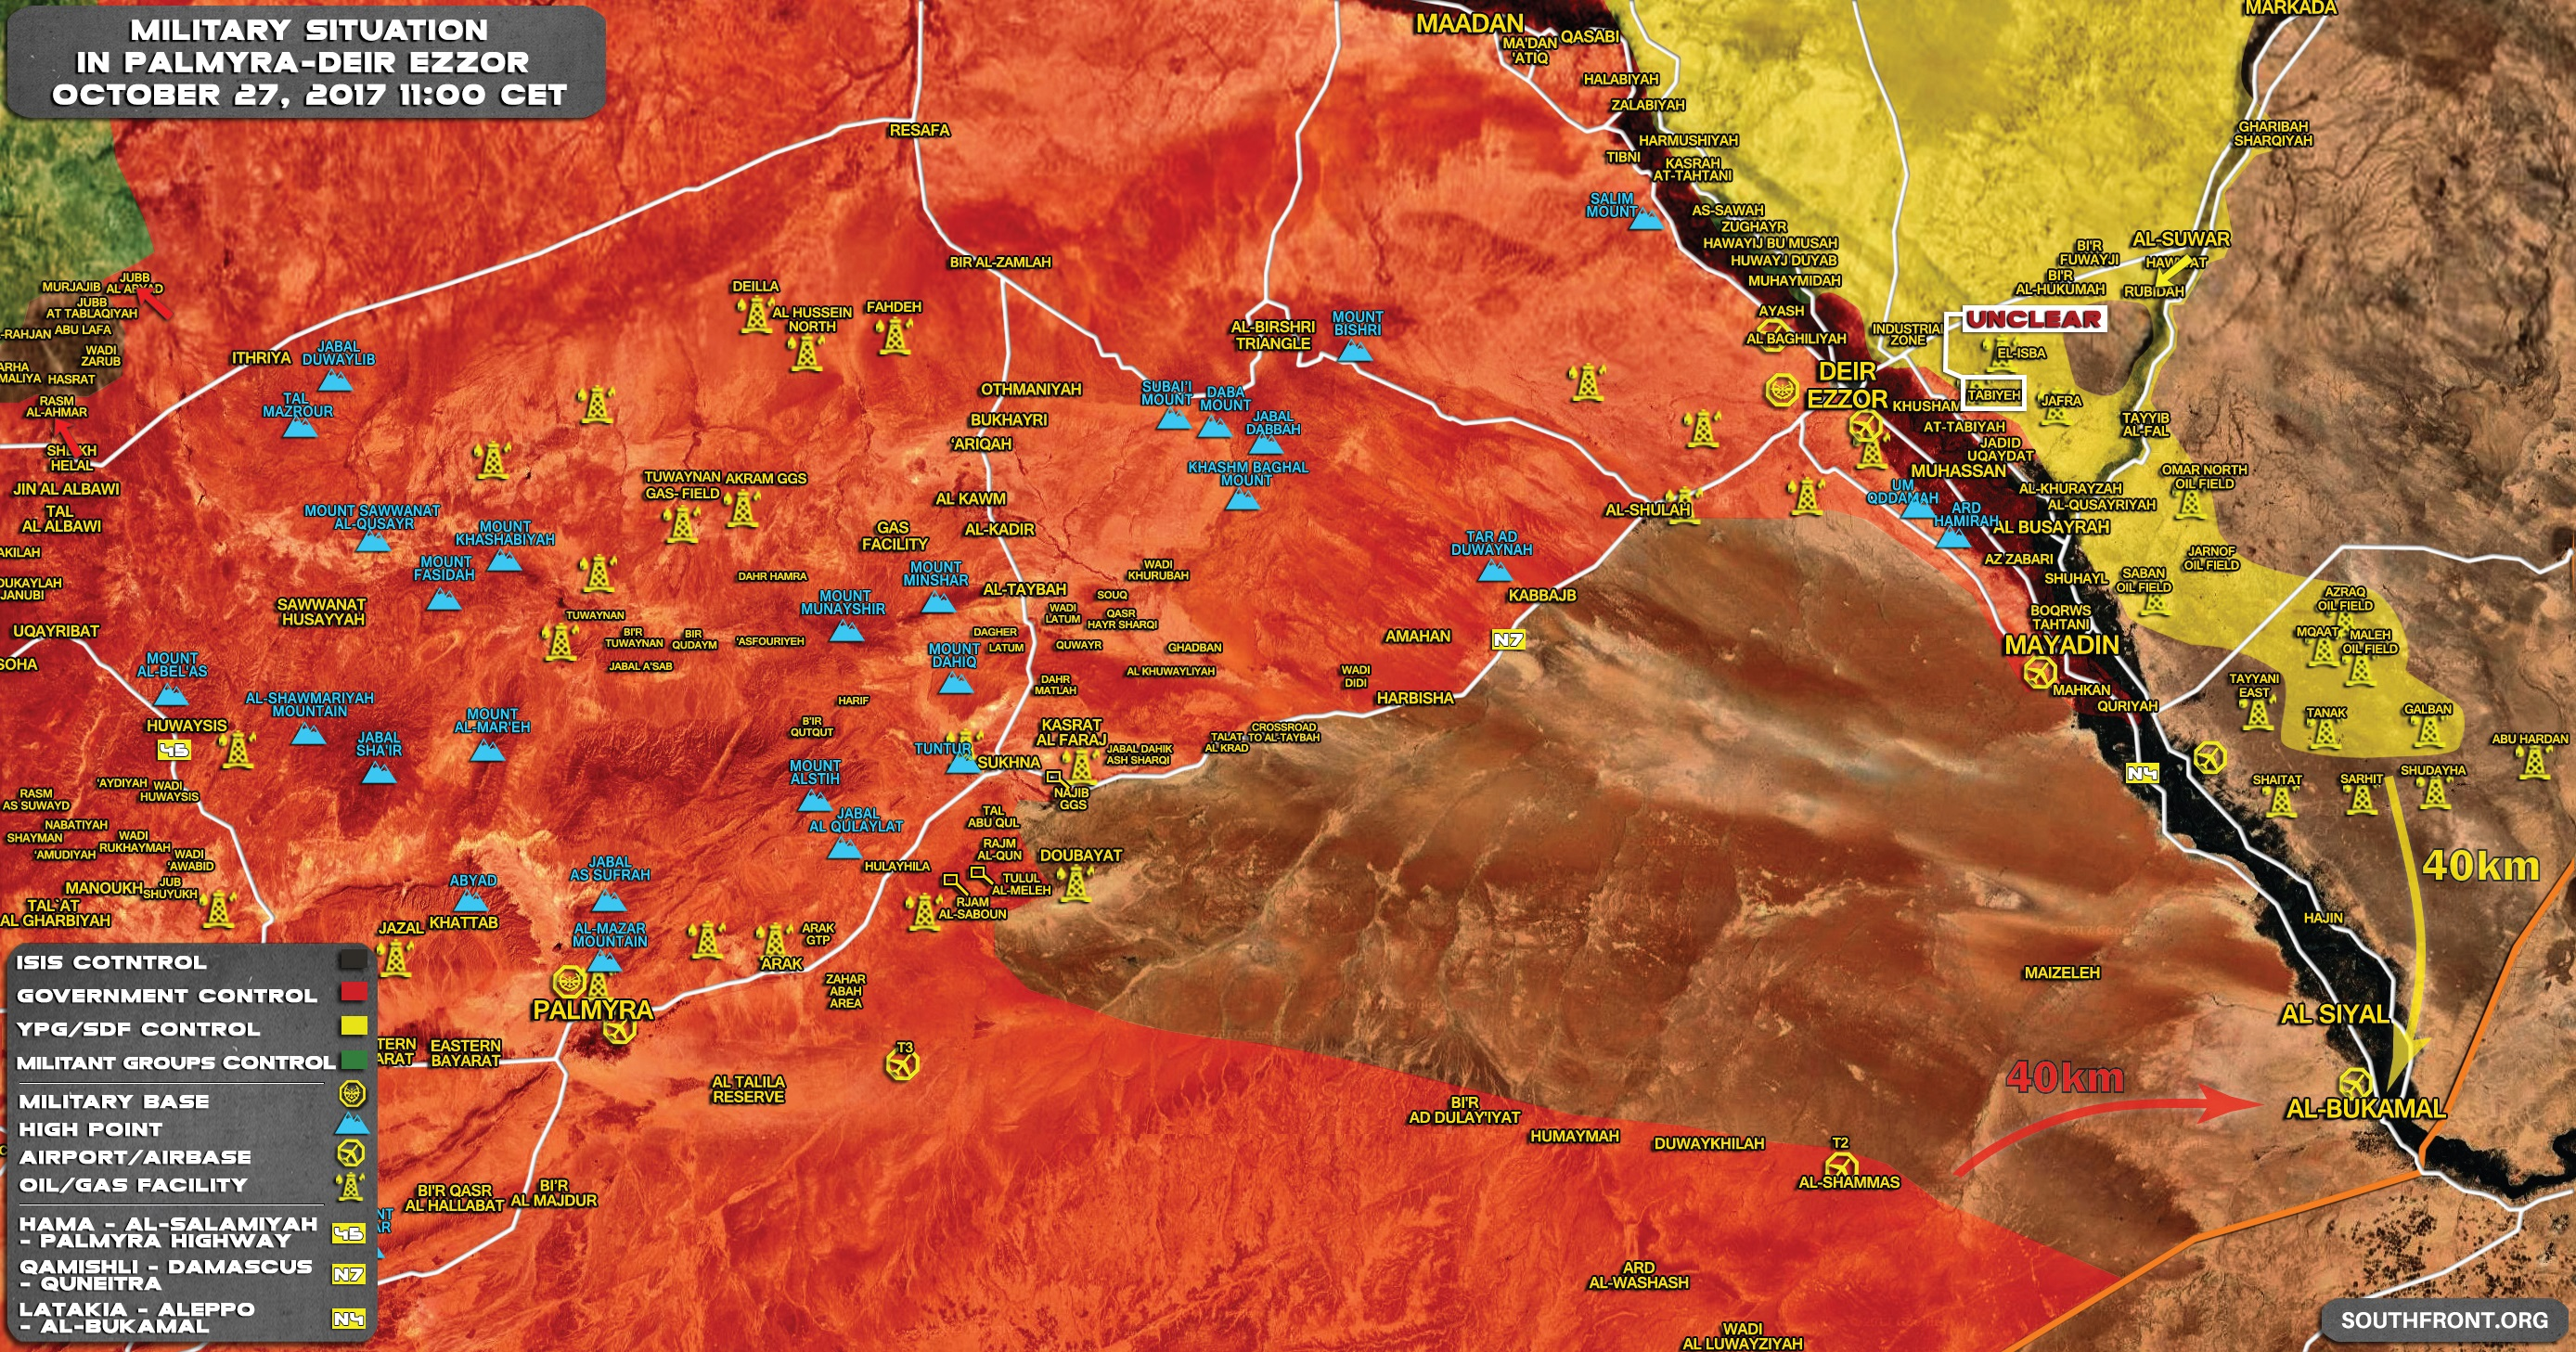 US-led Coalition Planning To Advance On Strategic Border Town Of Al-Bukamal